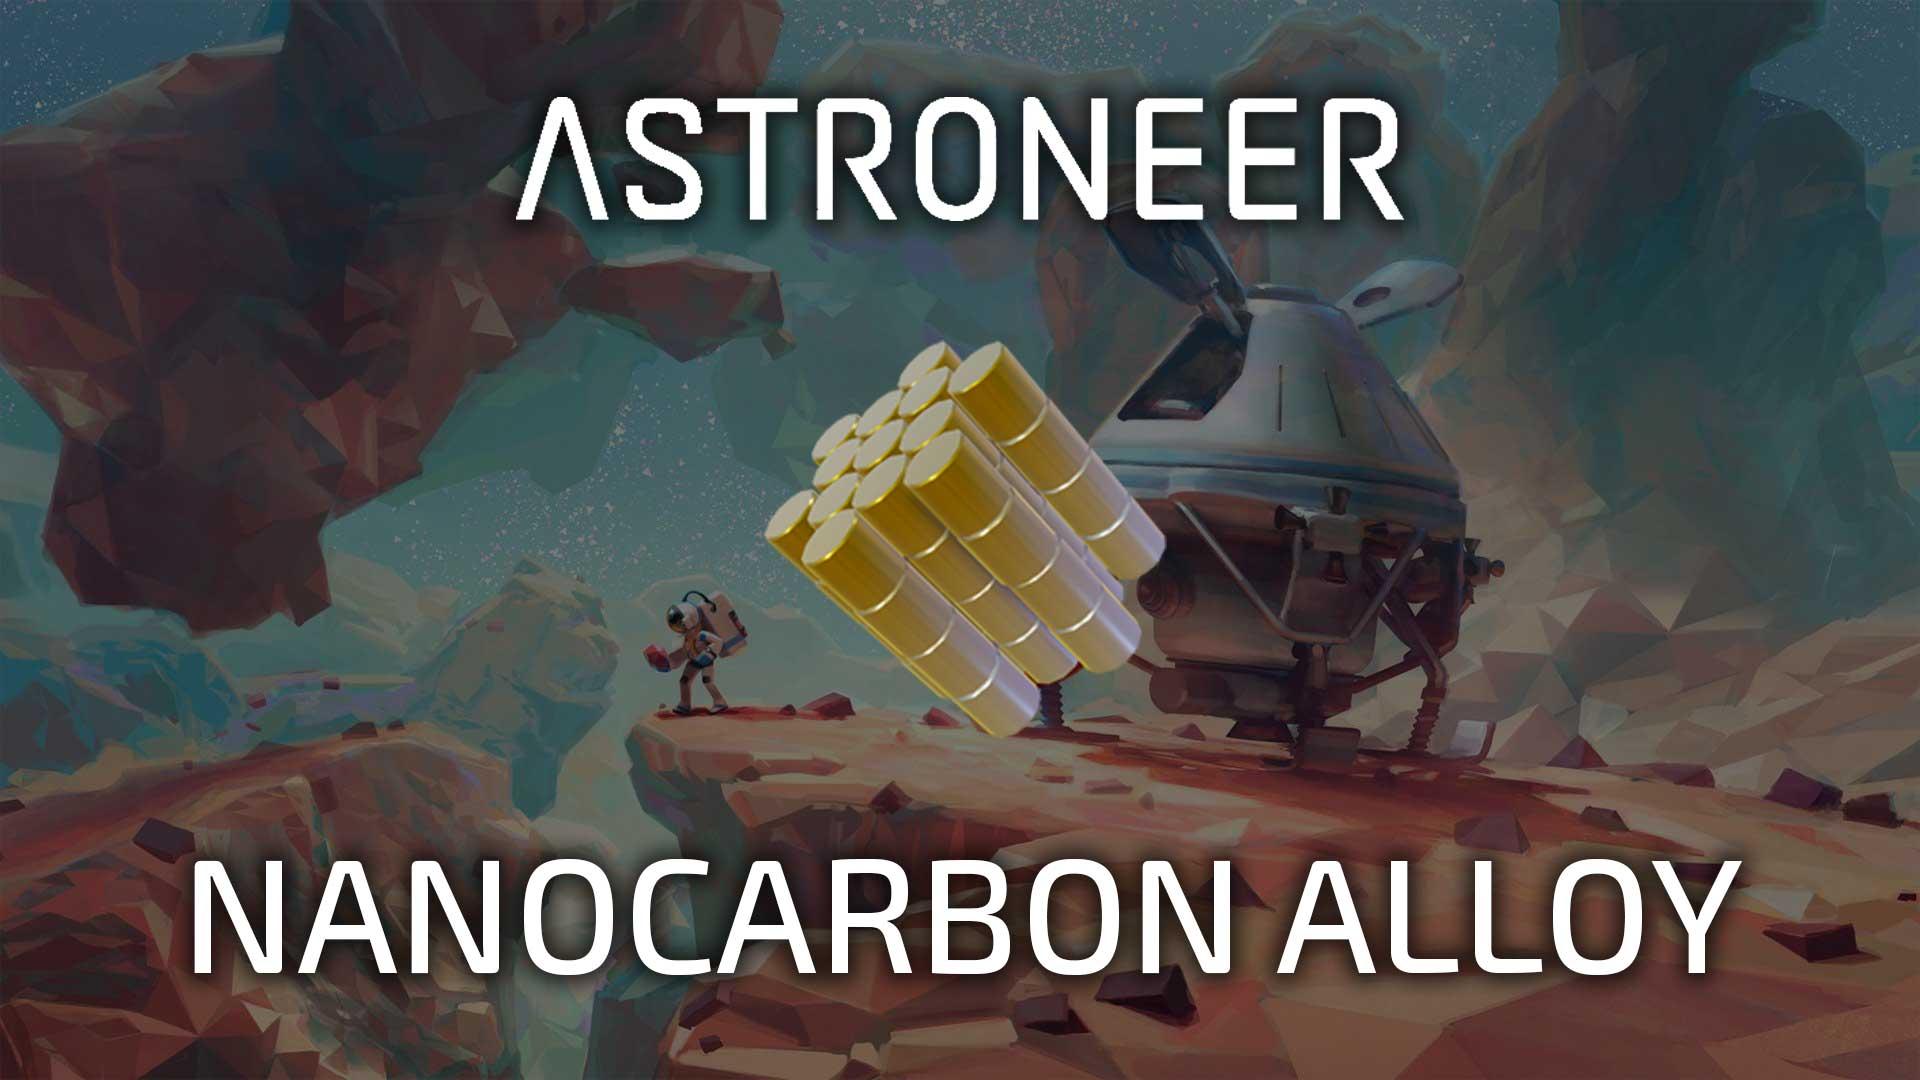 astroneer nanocarbon alloy